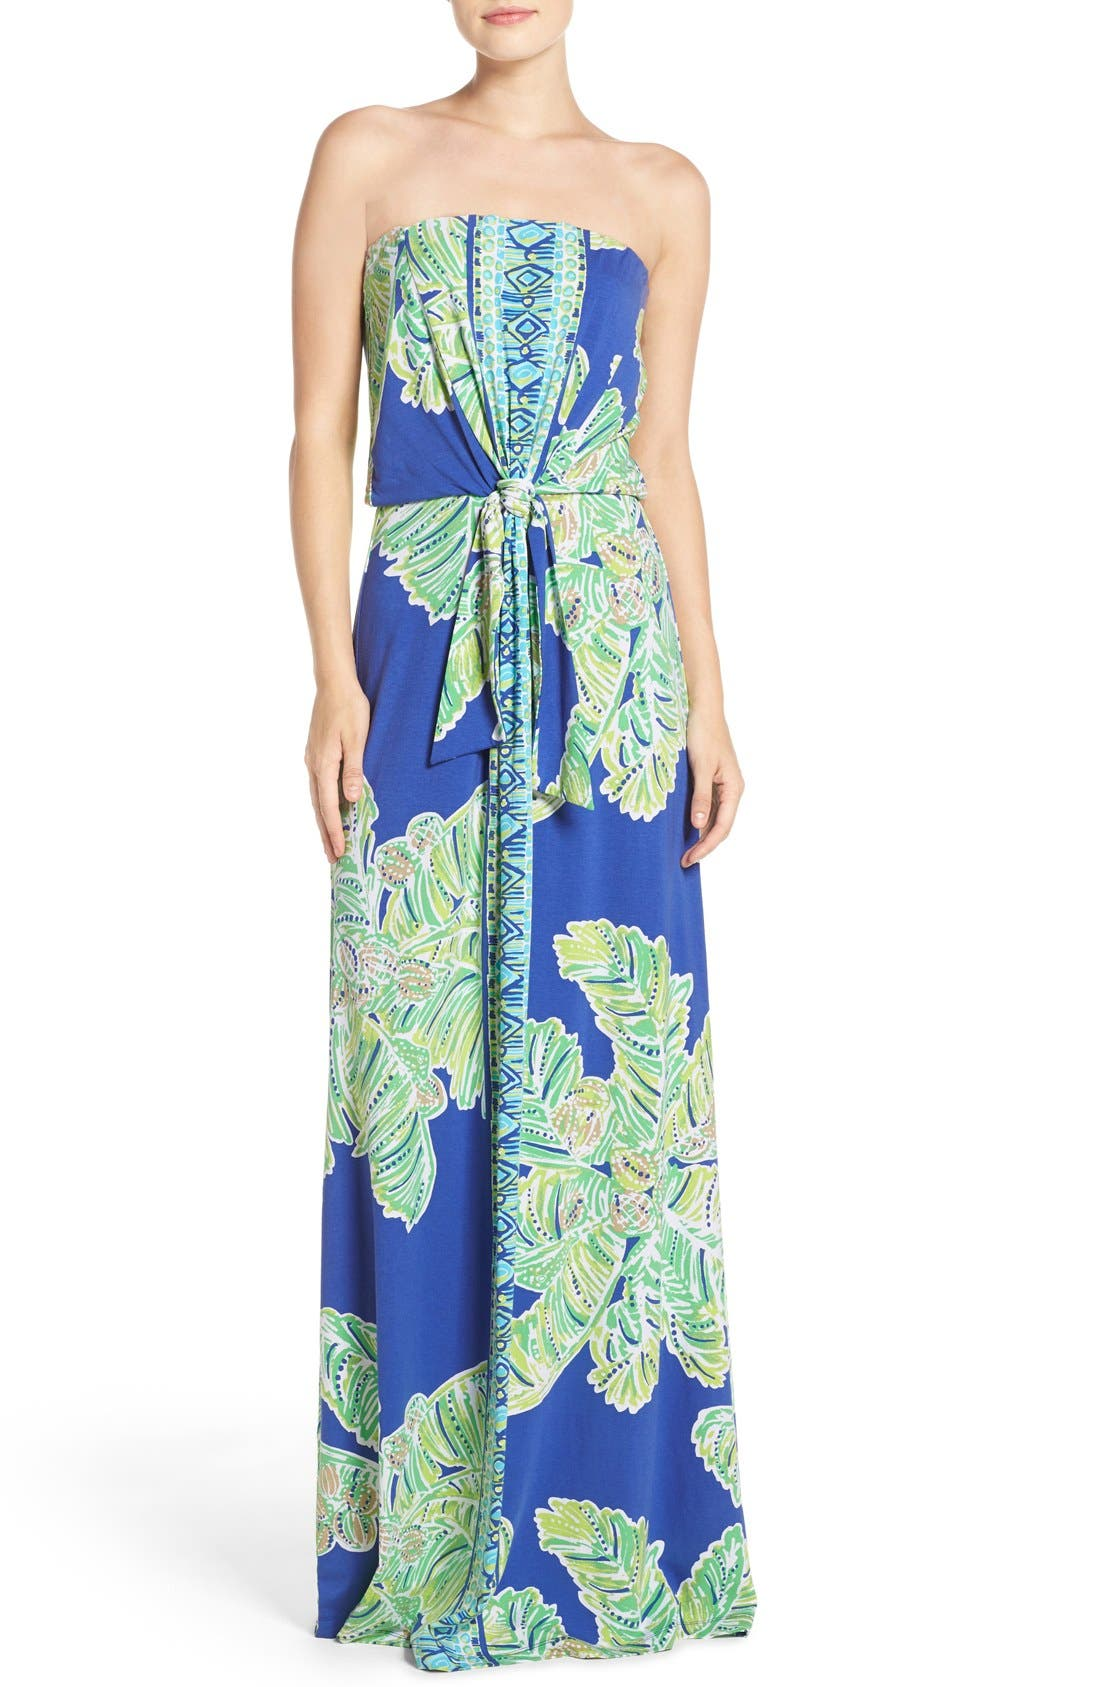 Alternate Image 1 Selected - Lilly Pulitzer® 'Rosalina' Strapless Maxi Dress